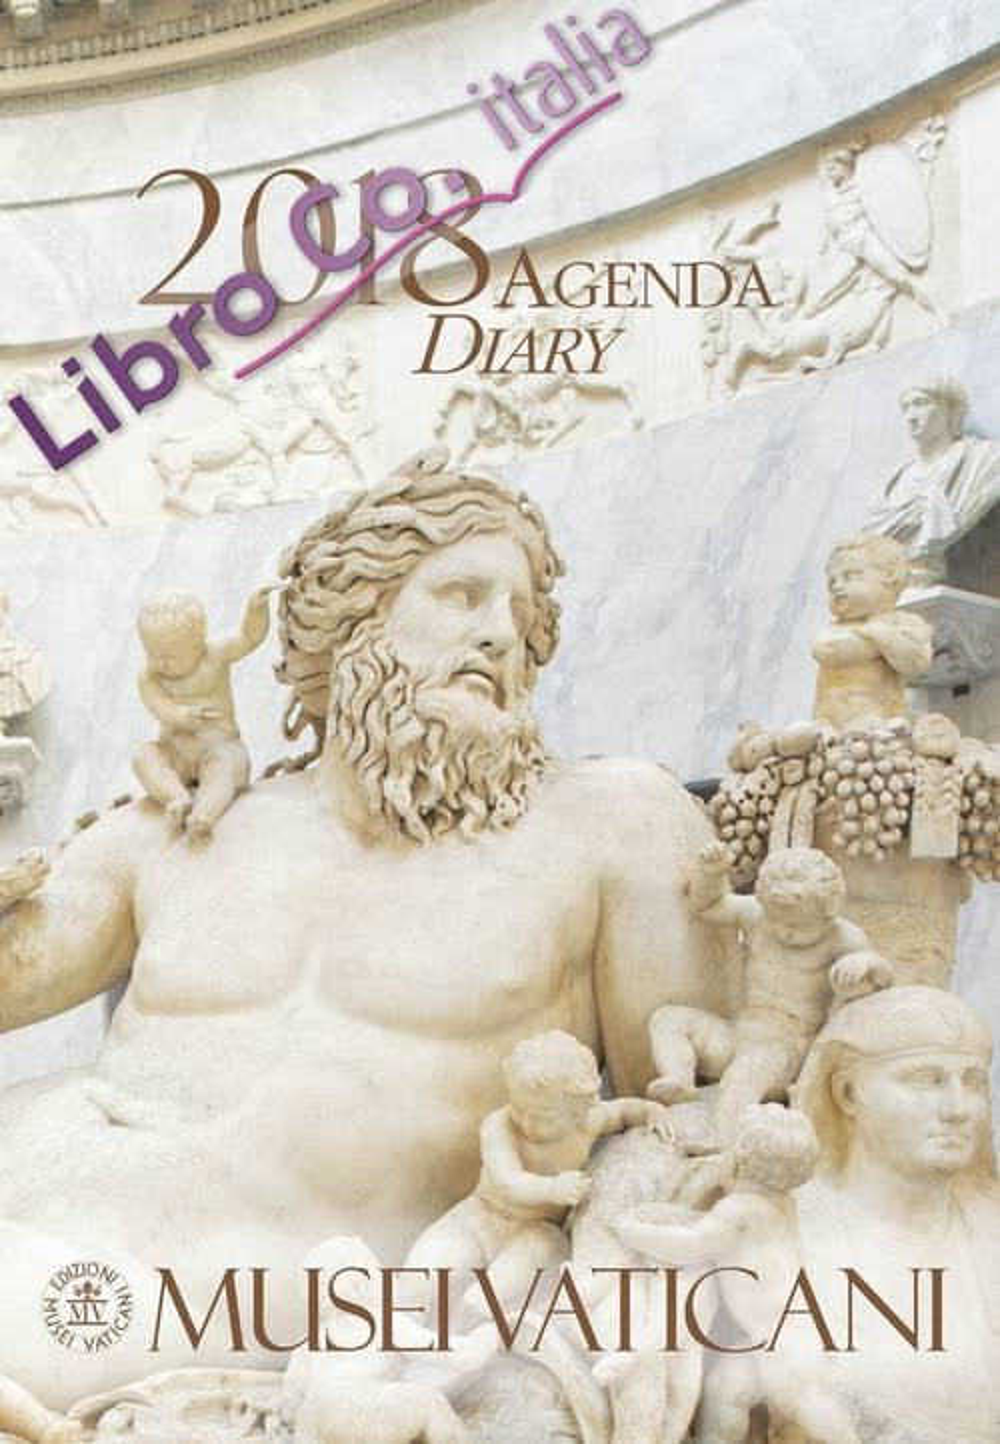 Agenda dei Musei Vaticani 2018. Ediz. italiana e inglese